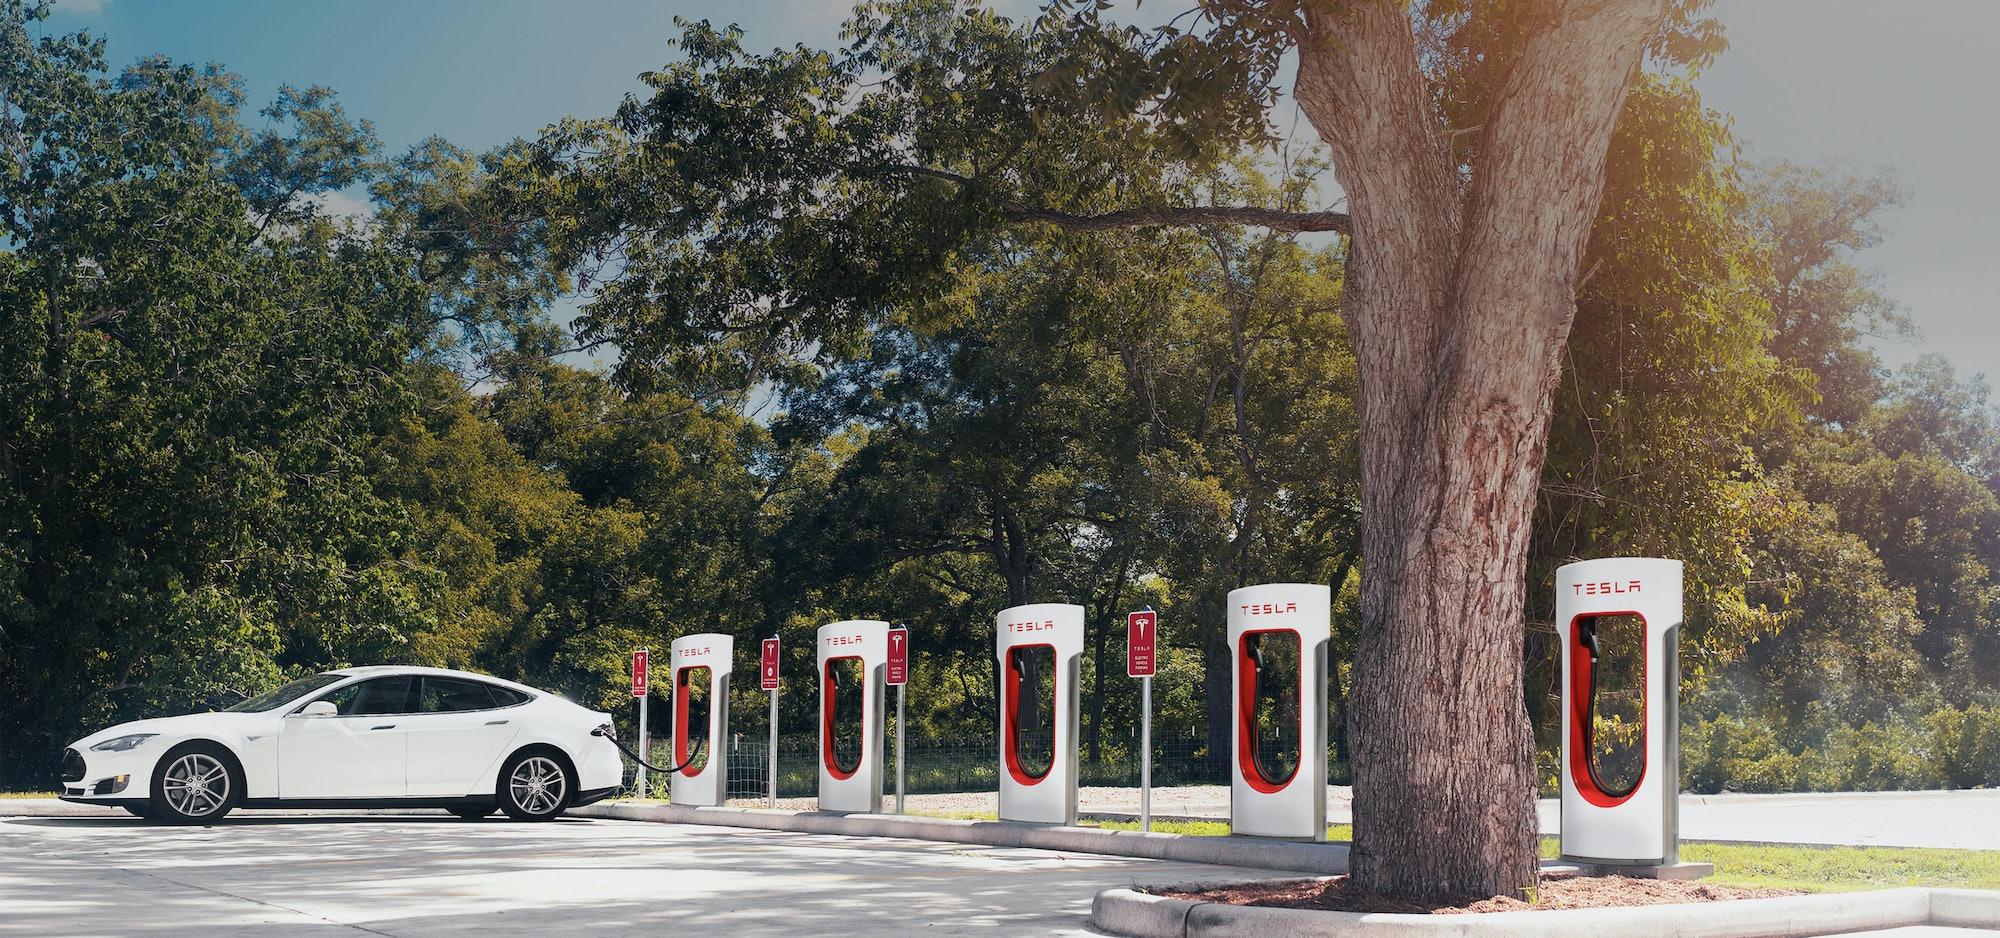 Tesla electric vehicle charging stations